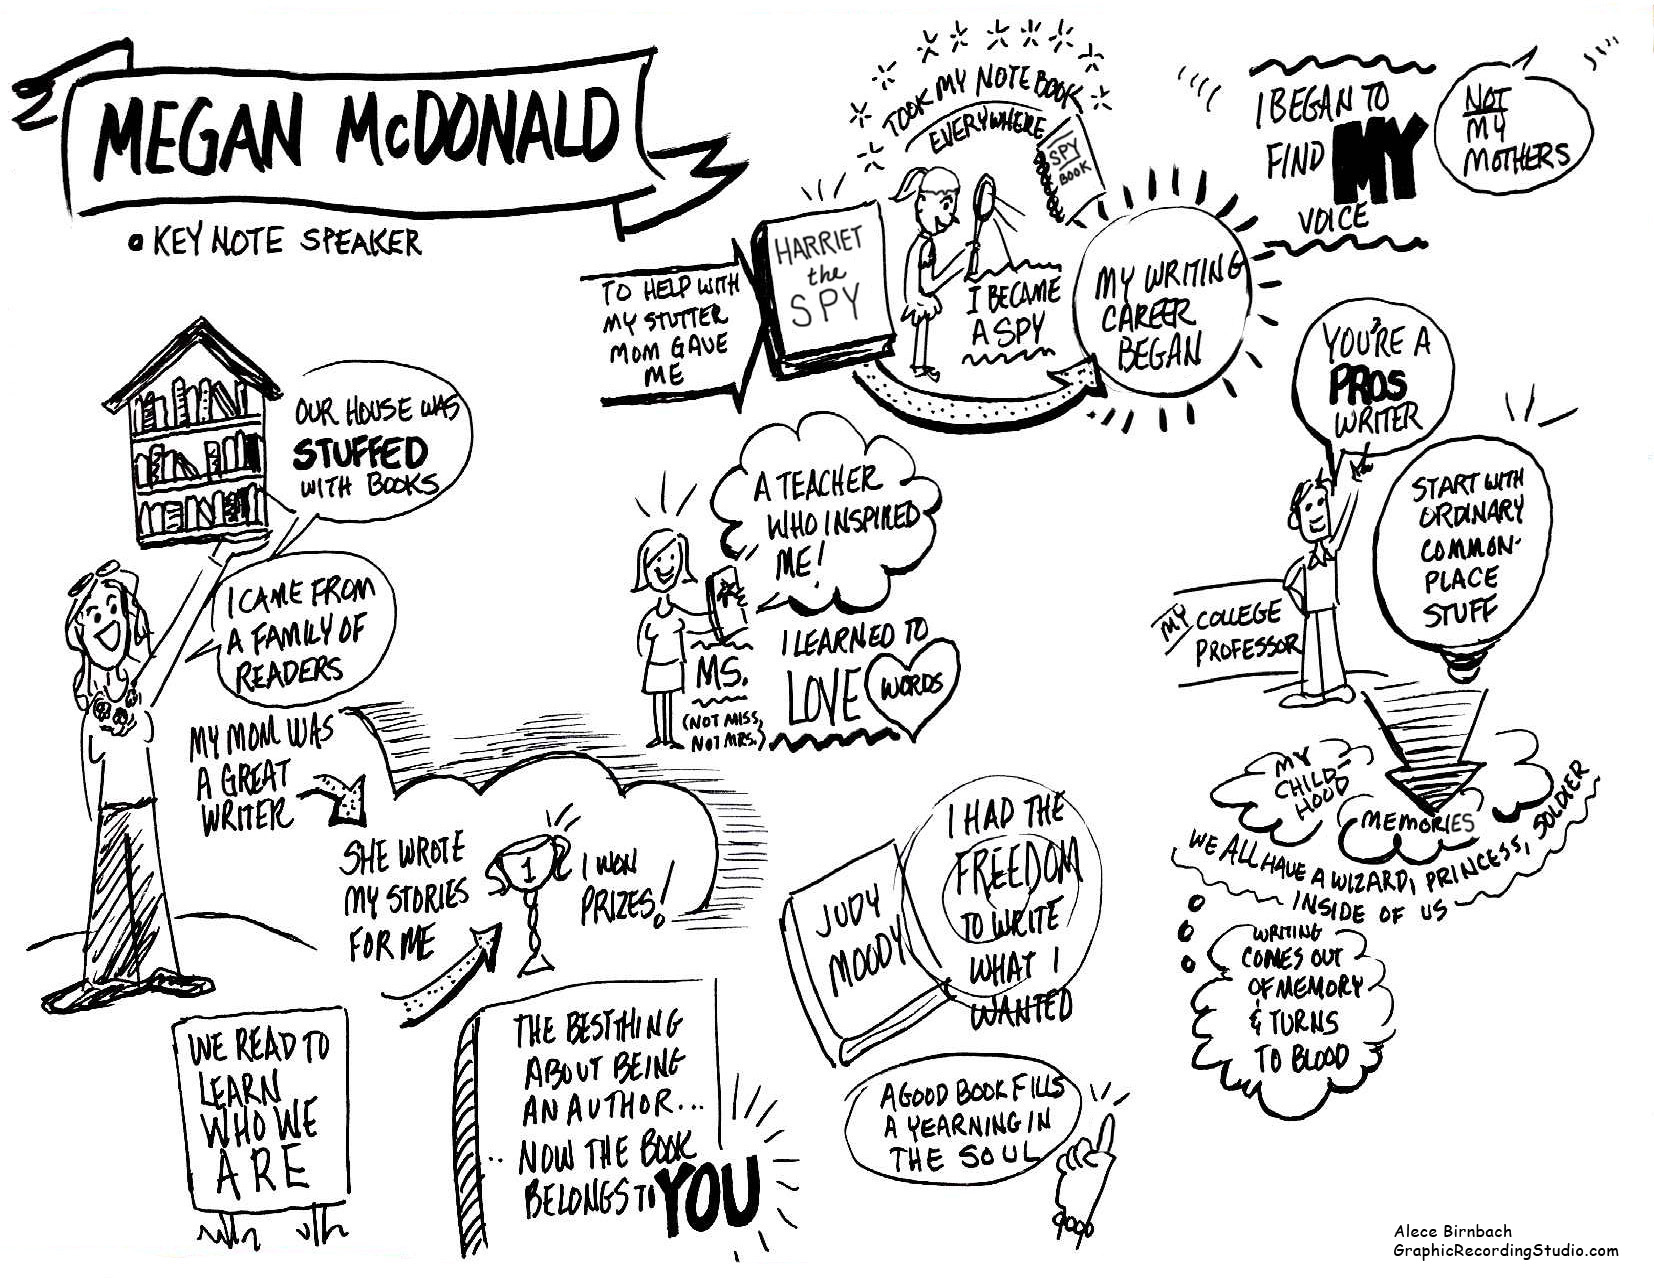 Megan-Mcdonald-keynote.jpg